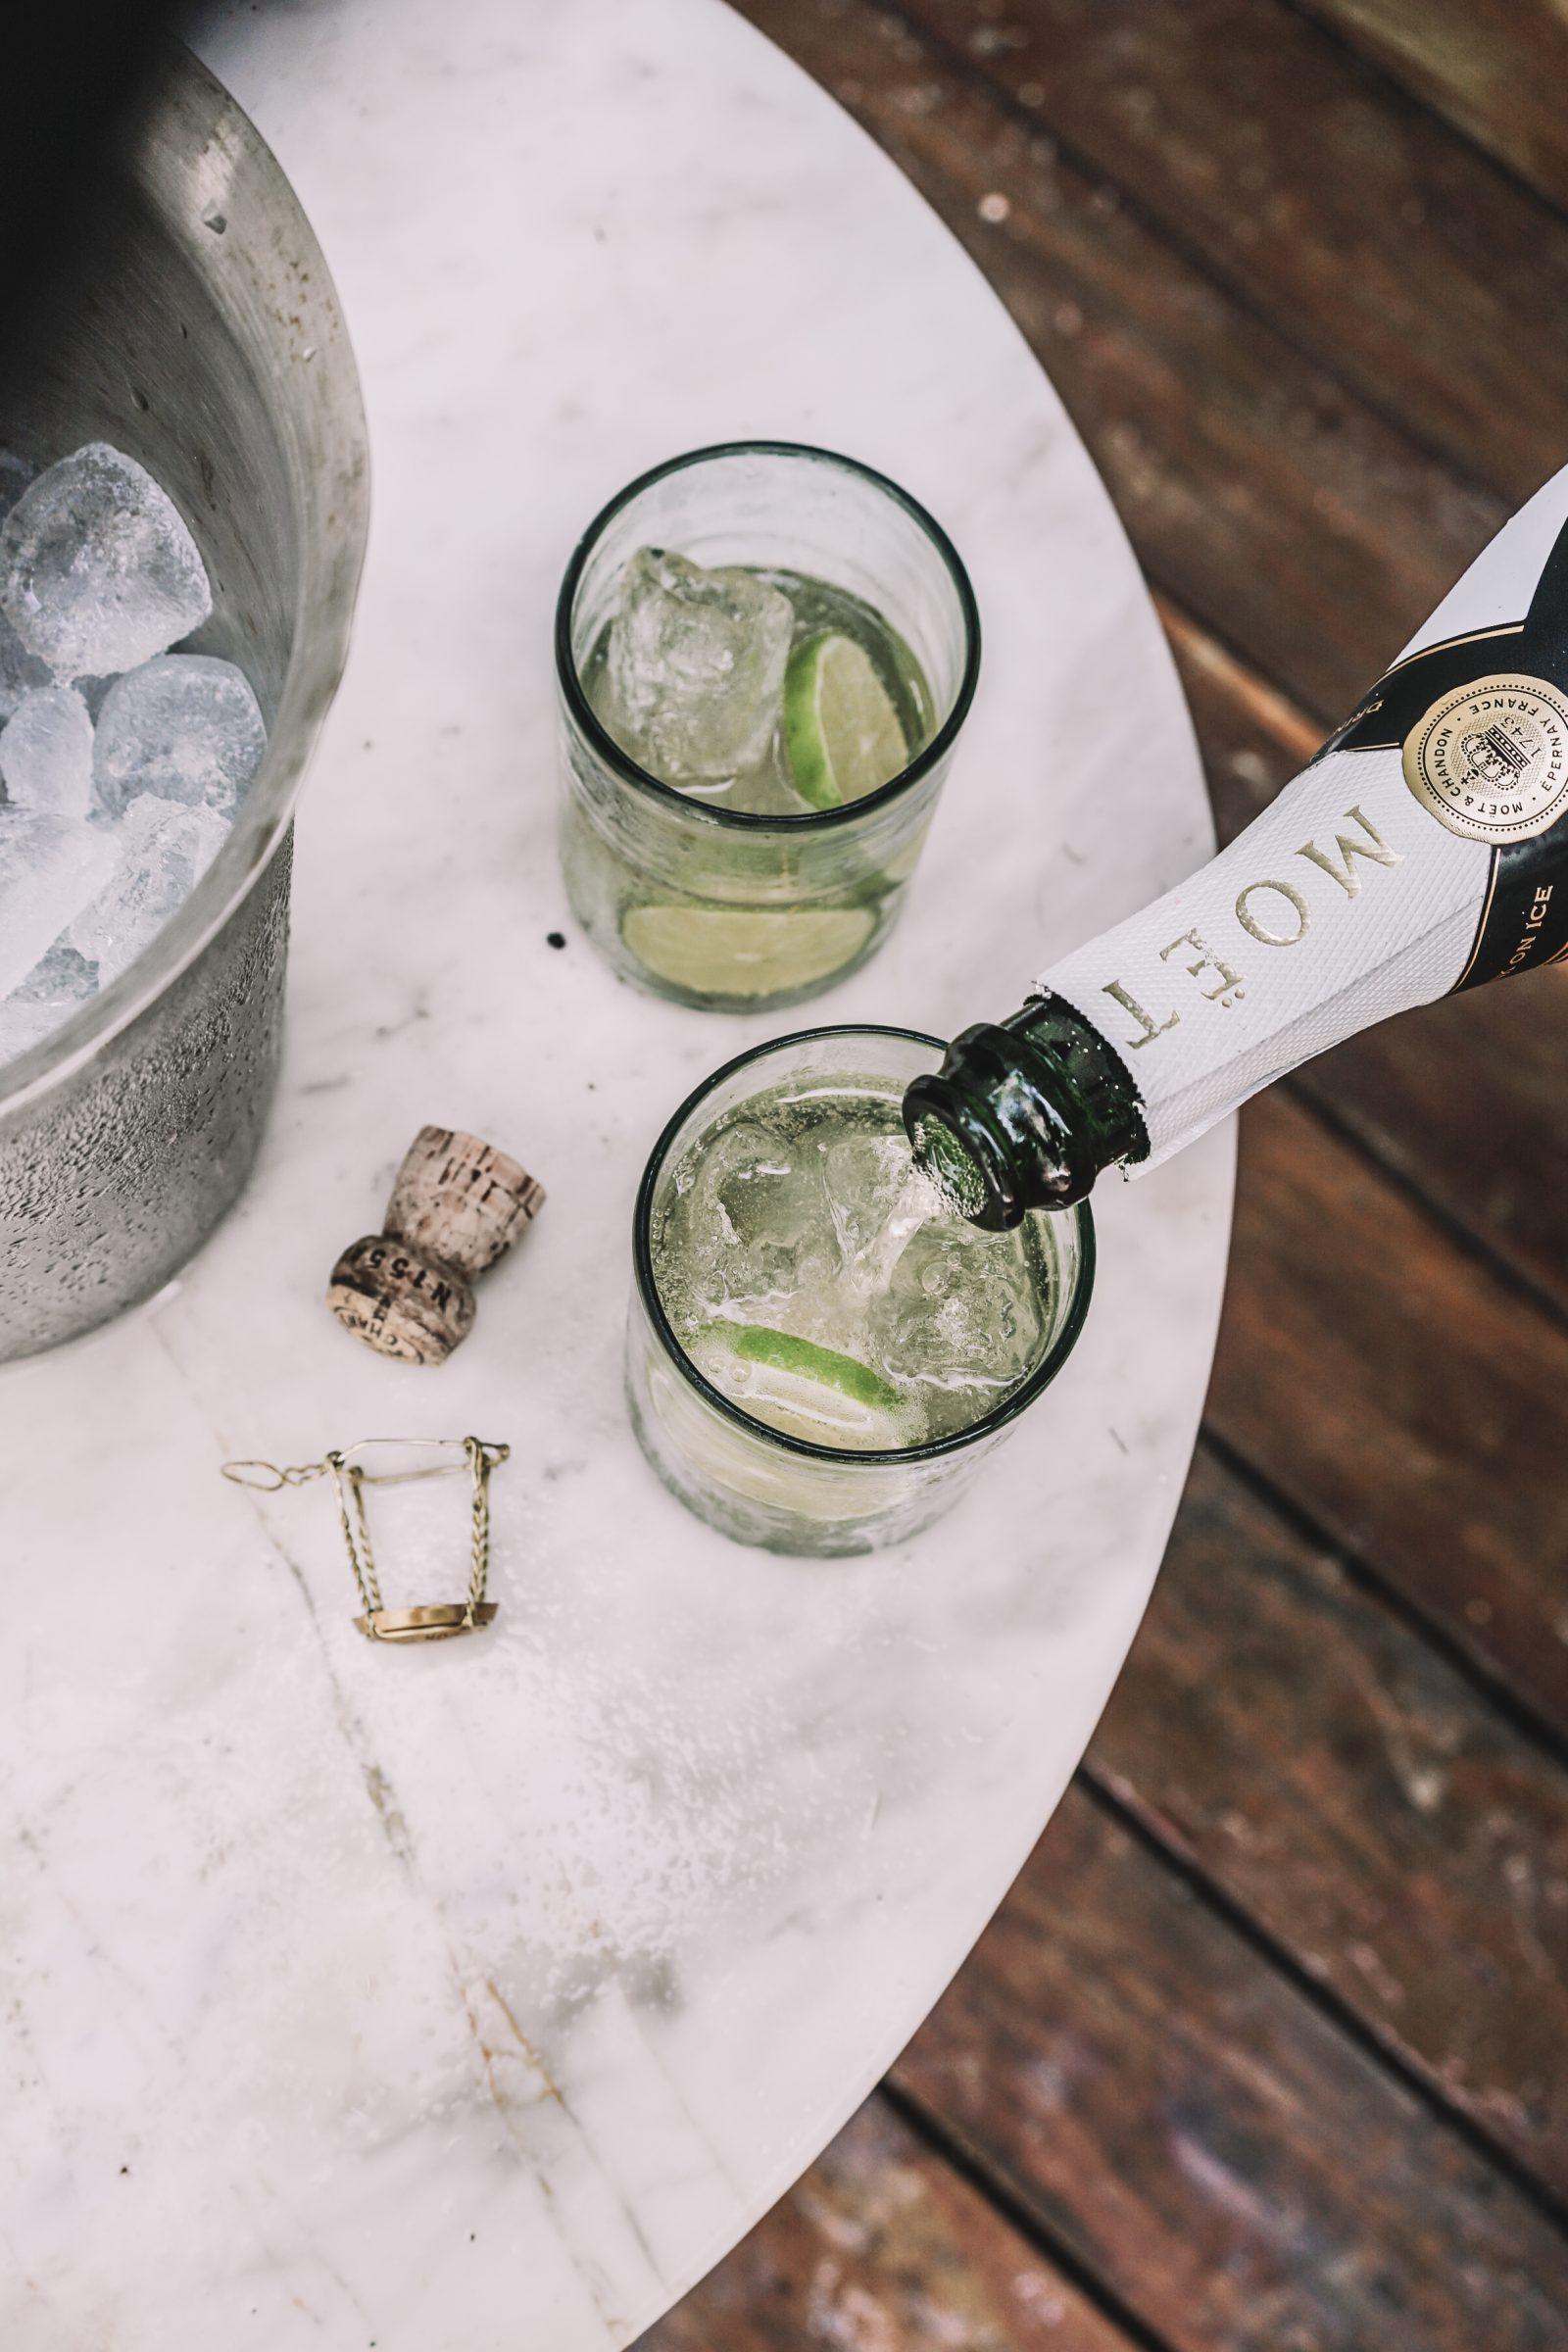 sanara_tulum-moet_chandon-champgne-she_made_me-collage_vintage-26